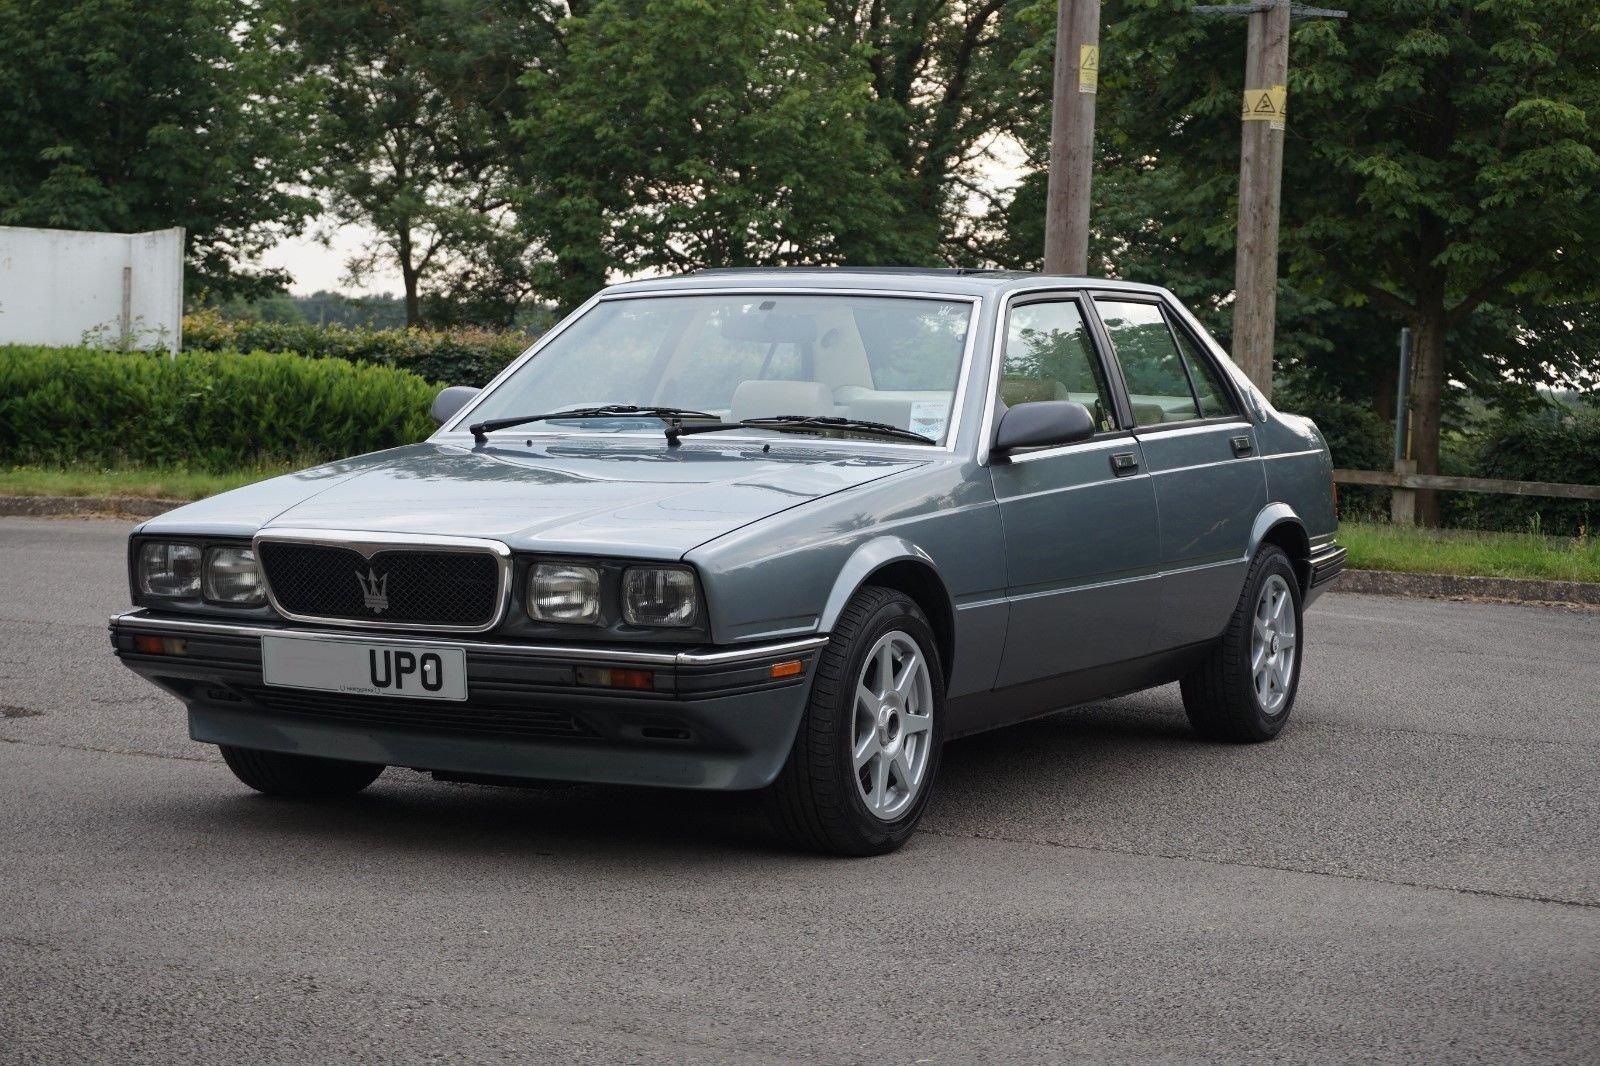 1989 Maserati biturbo 430 25300 miles RHD new MOT +Belt For Sale (picture 1 of 6)